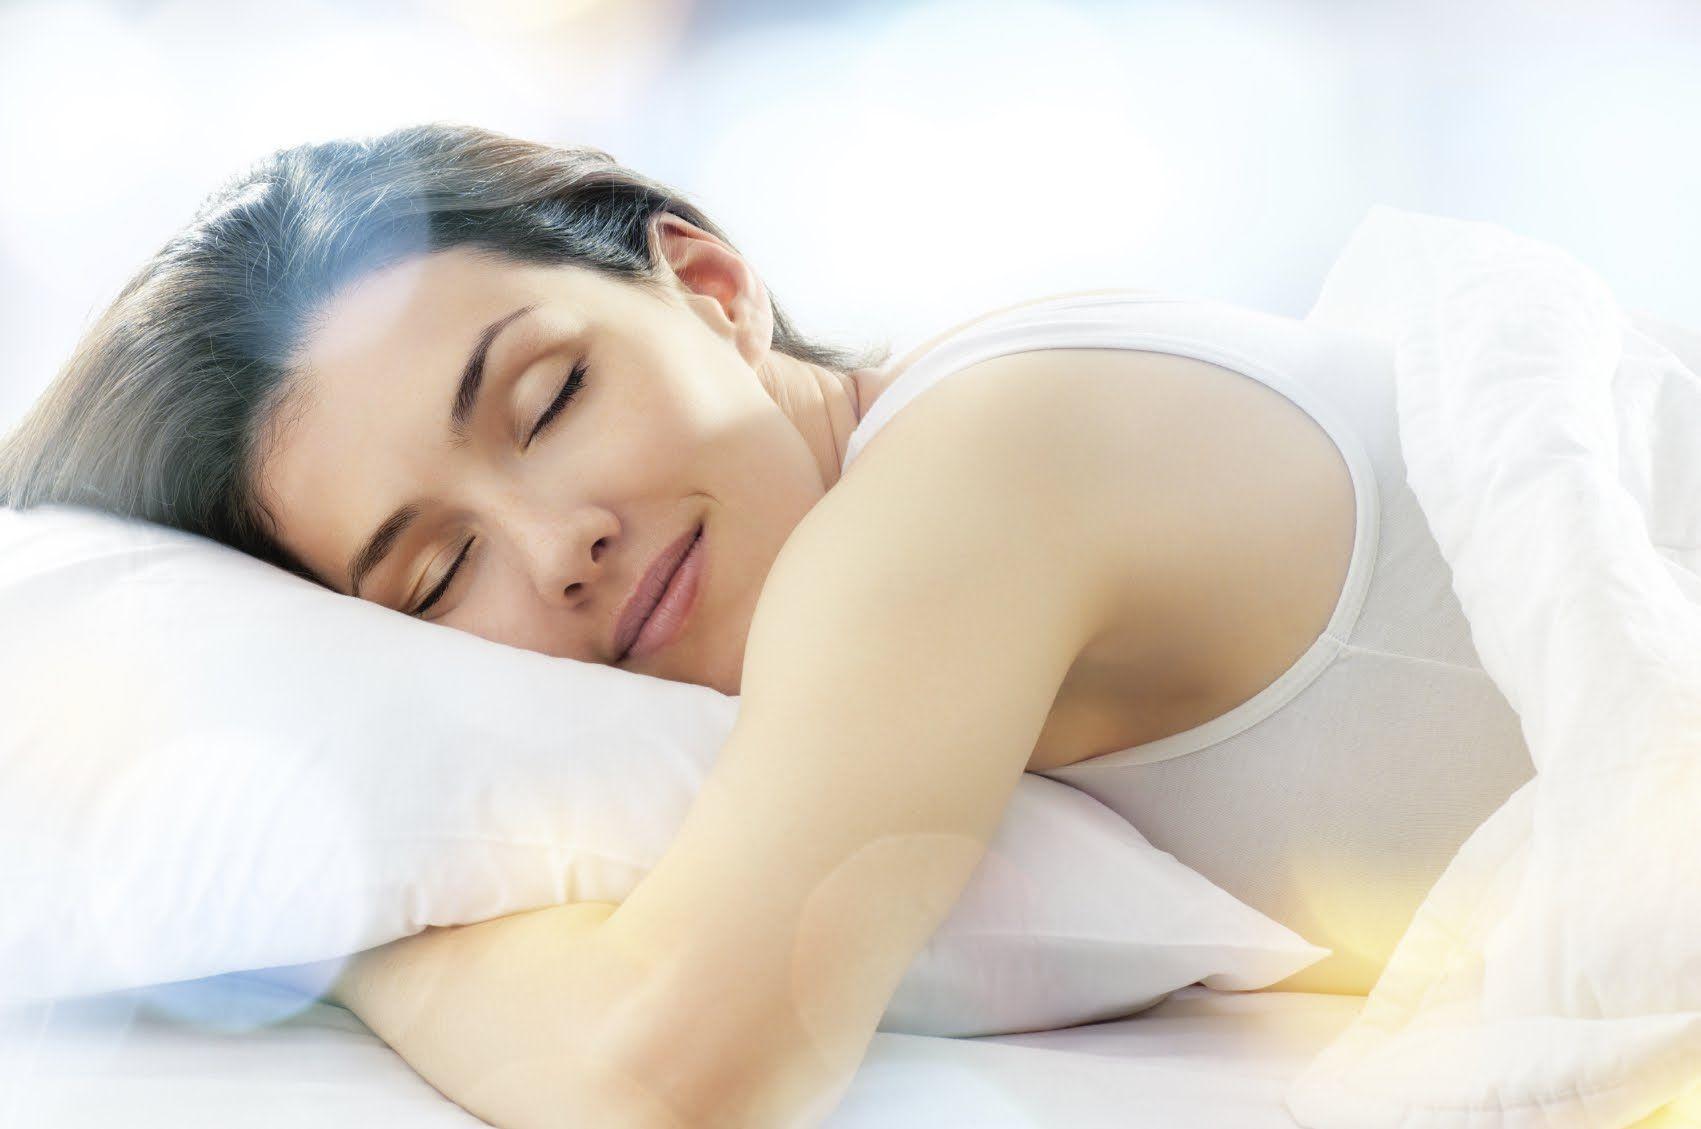 Sweating While Sleeping, Excessive Armpit Sweating, Sweat Rash ...